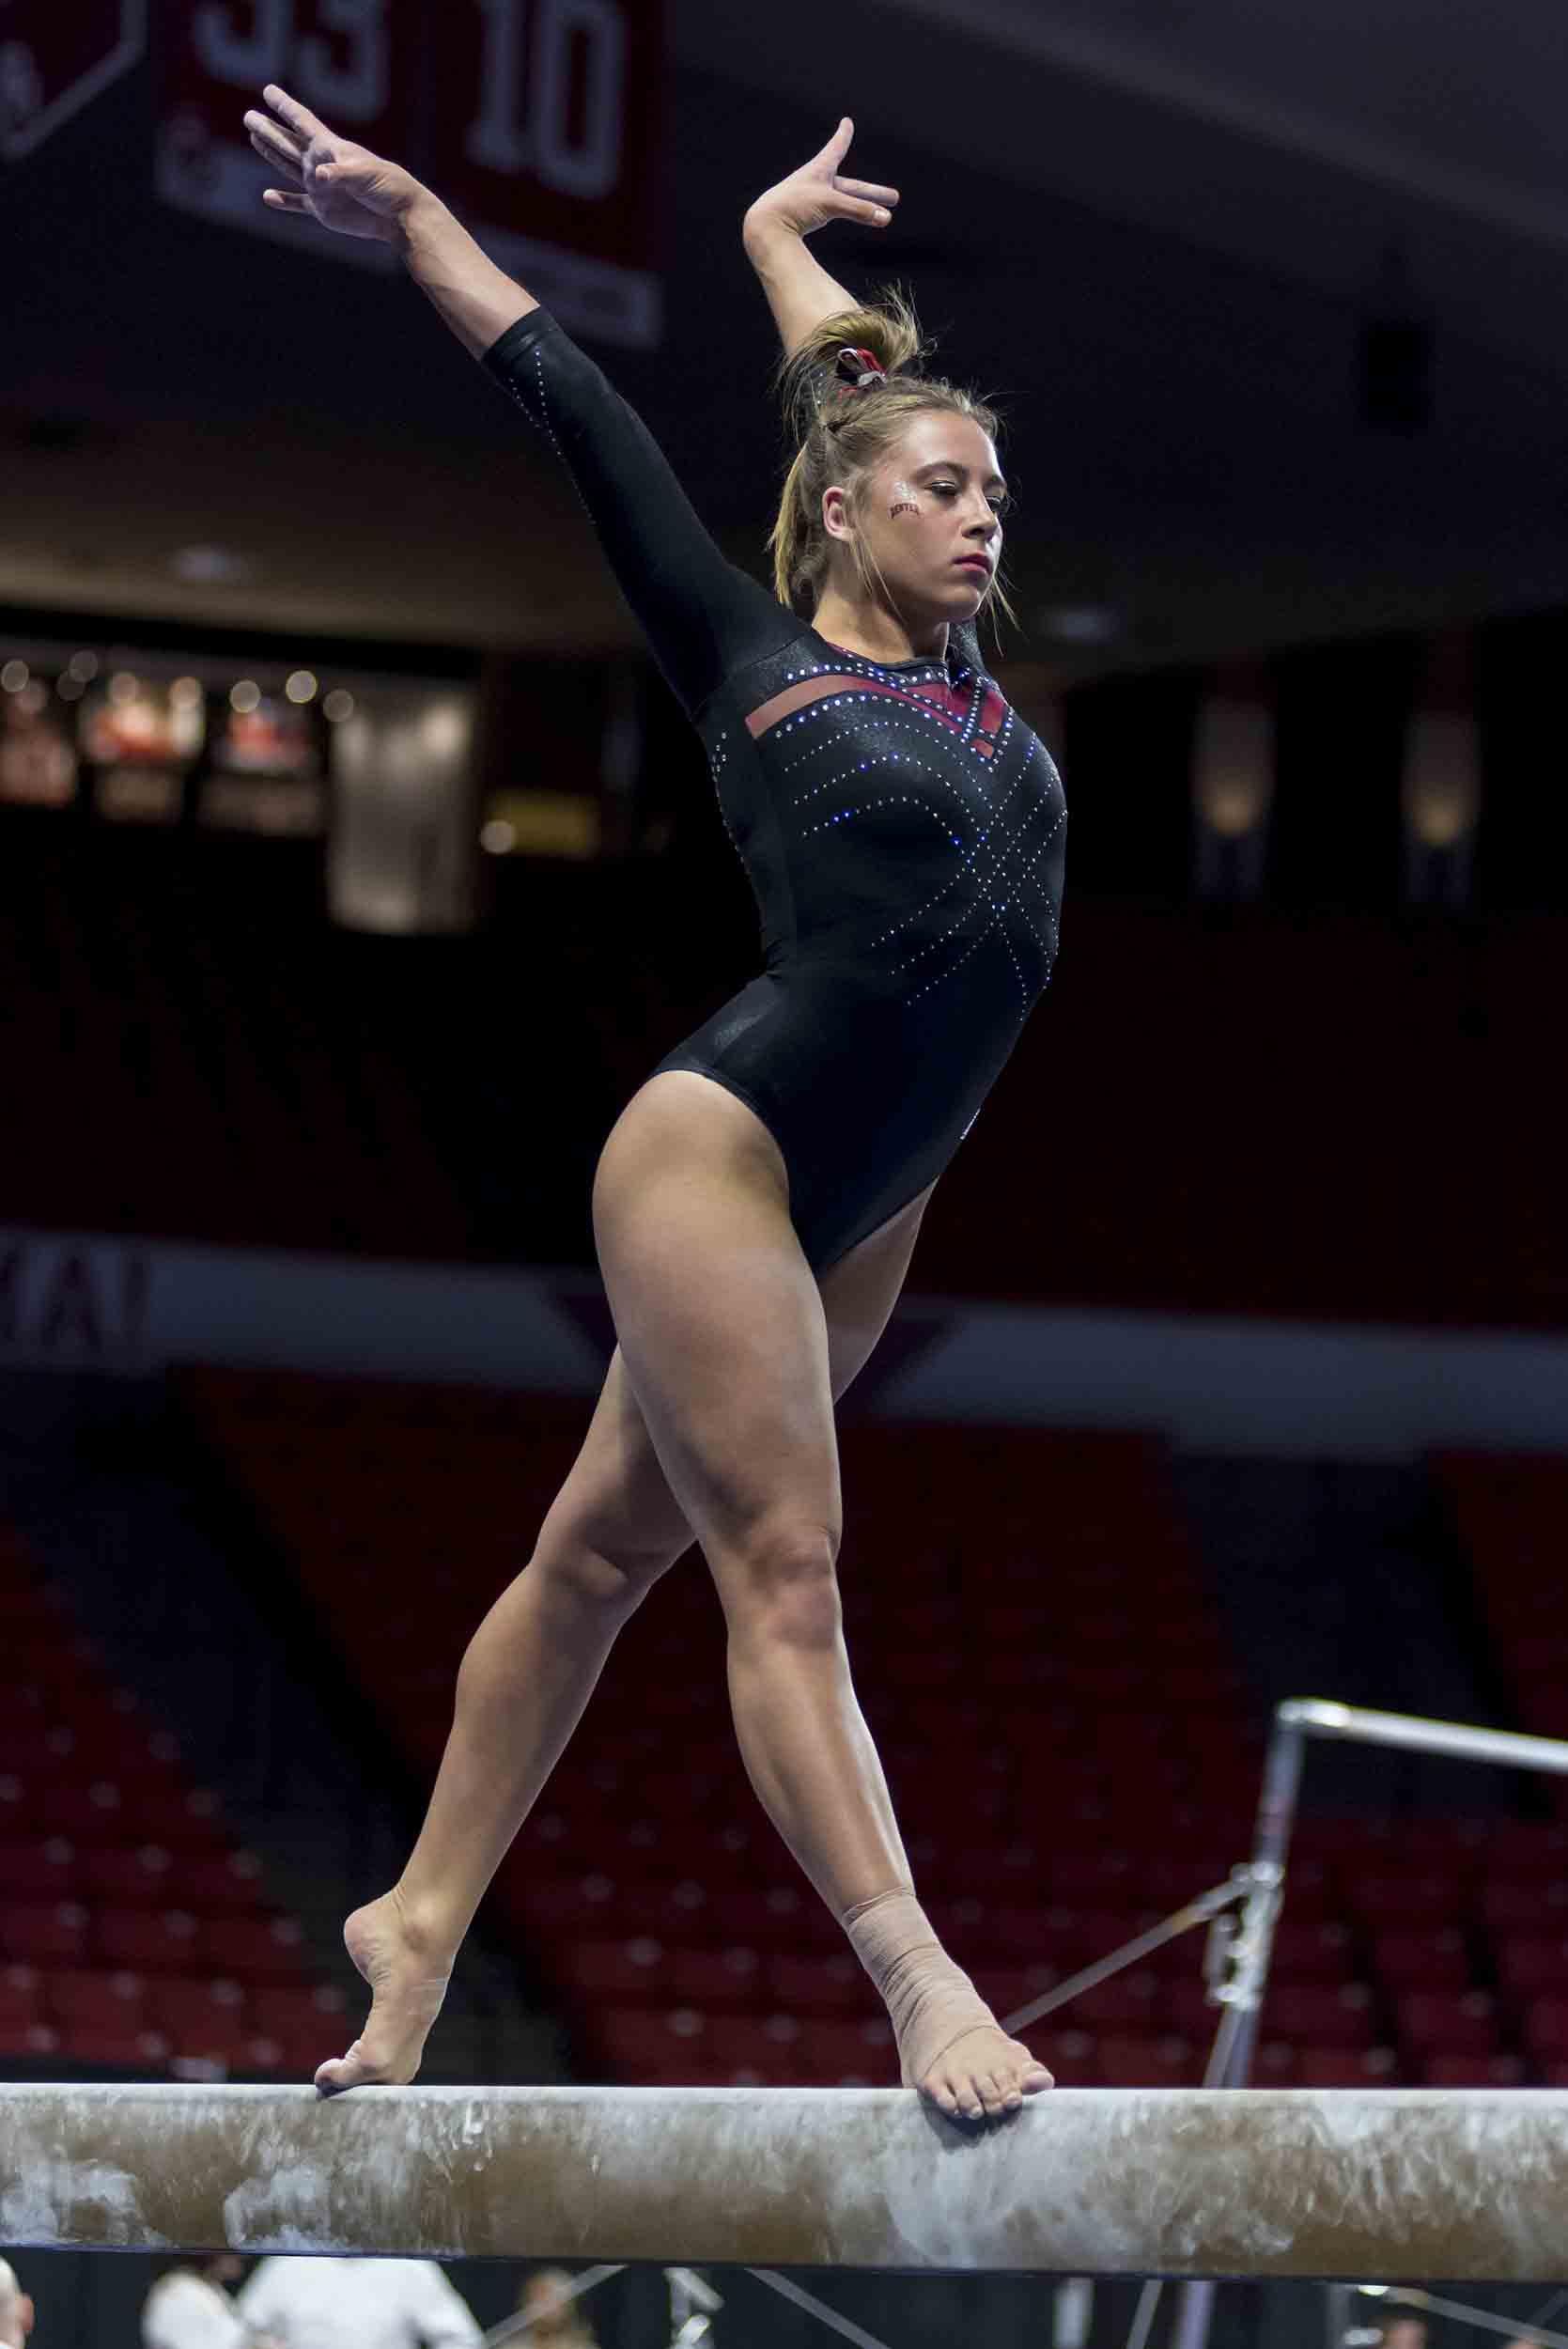 Maddie Karr on the balance beam.